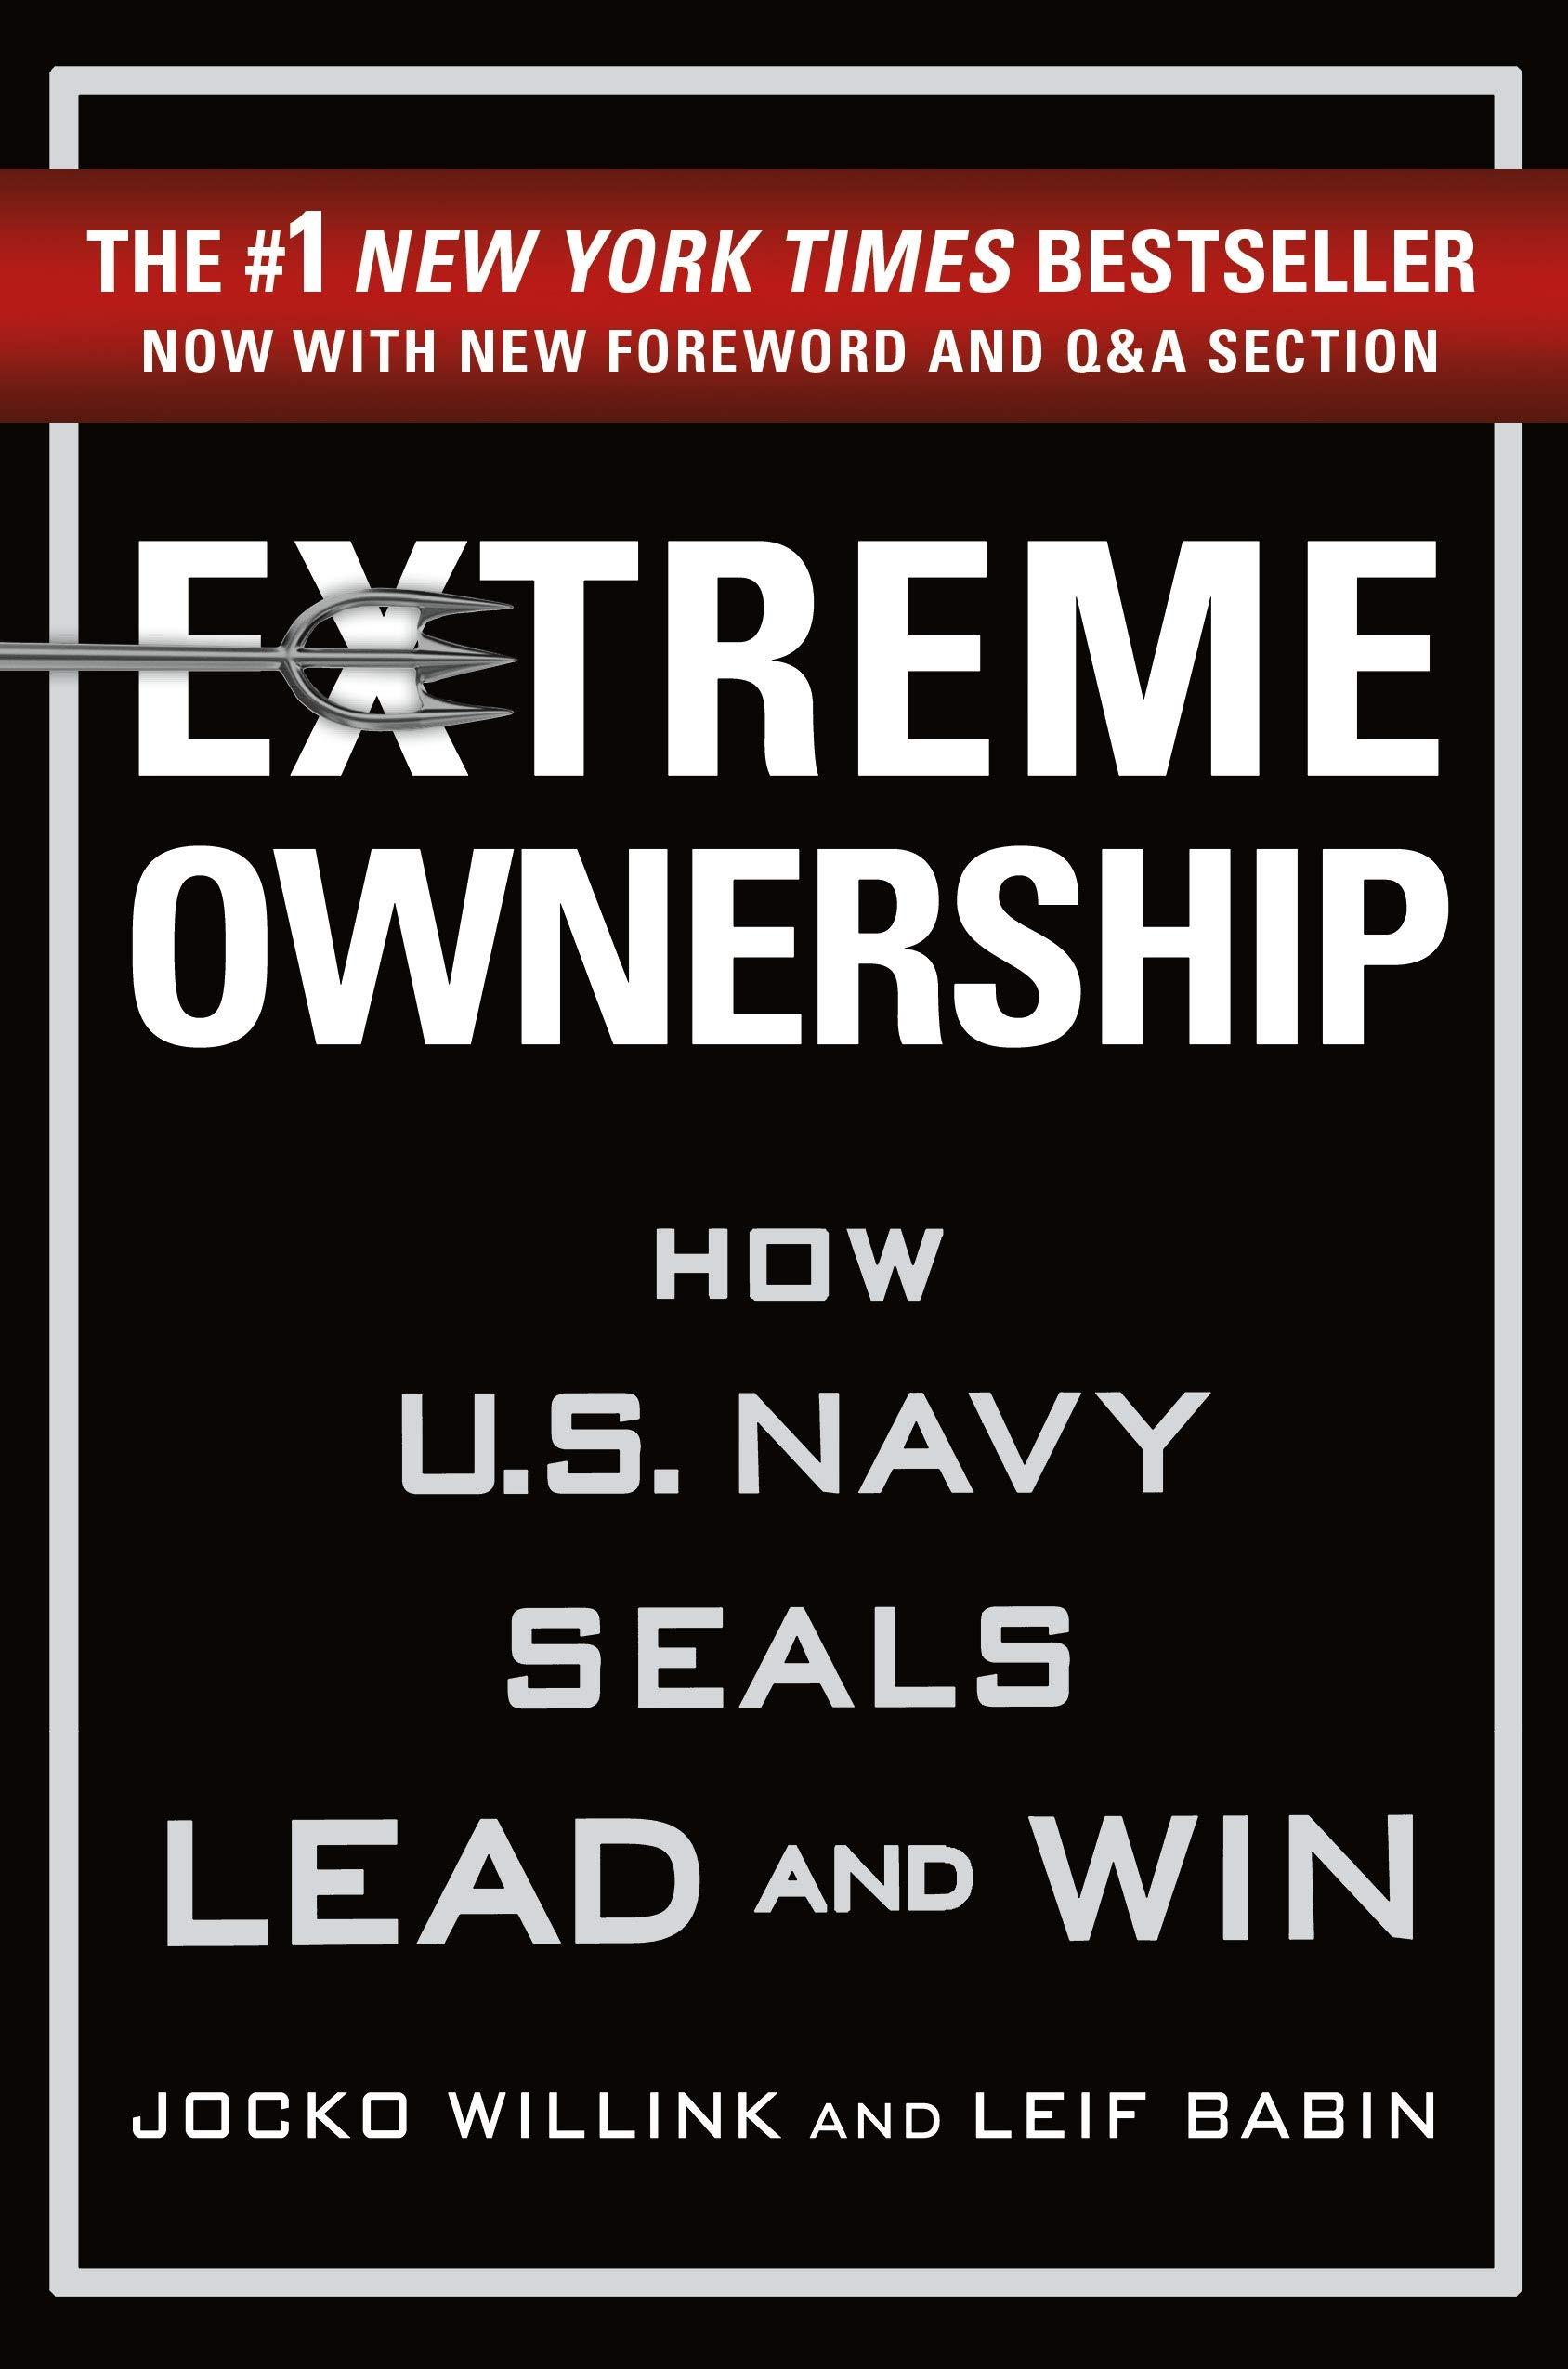 Extreme Ownershipownership